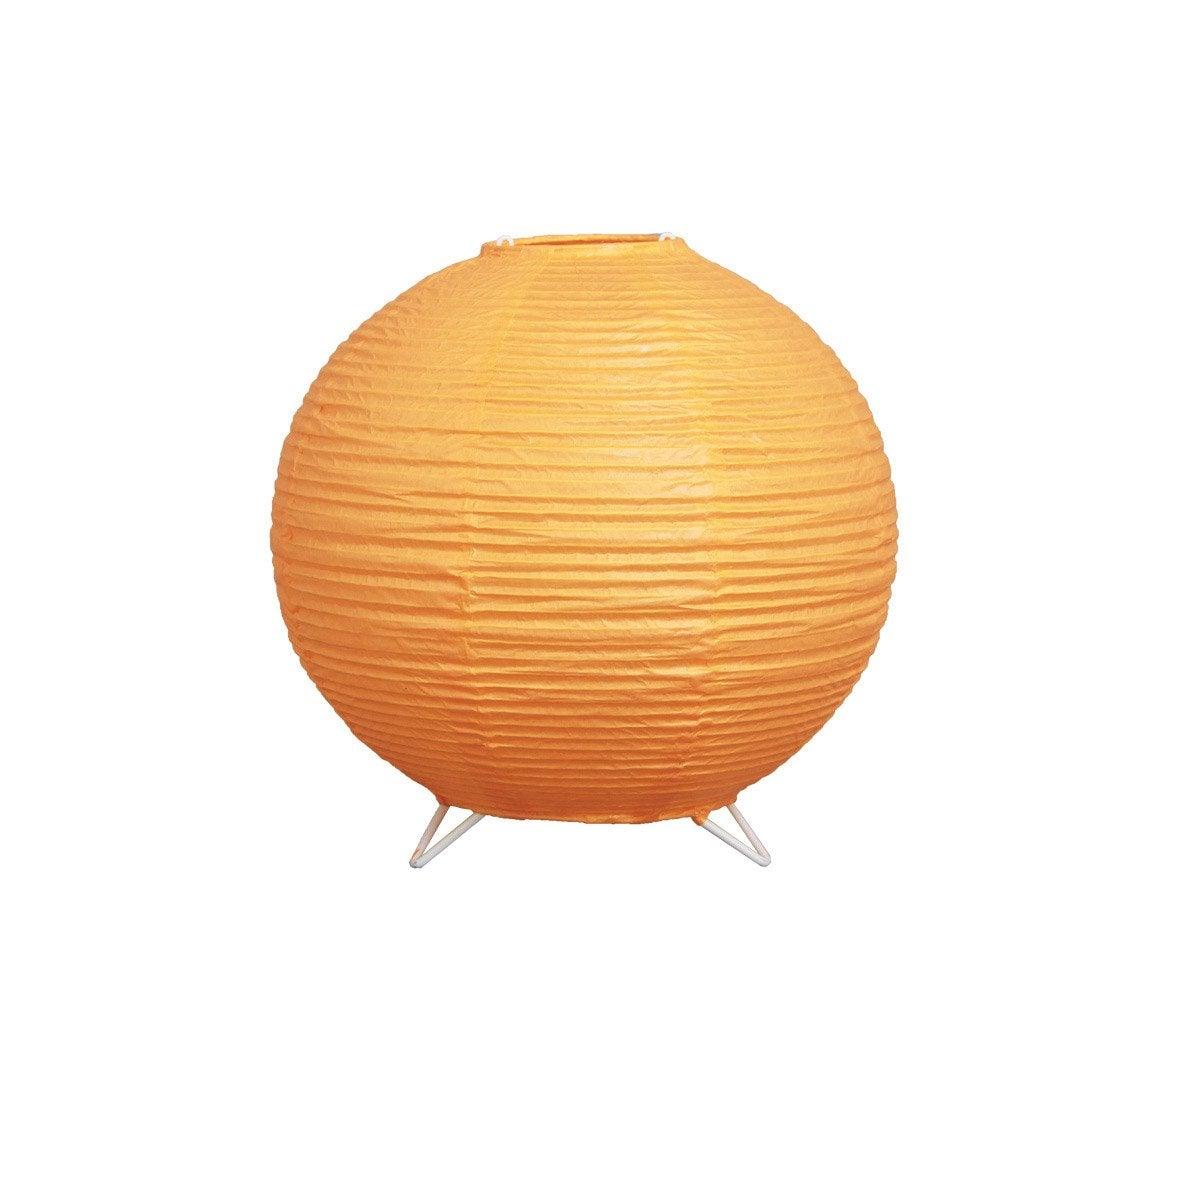 lampe baoji inspire papier orange leroy merlin. Black Bedroom Furniture Sets. Home Design Ideas